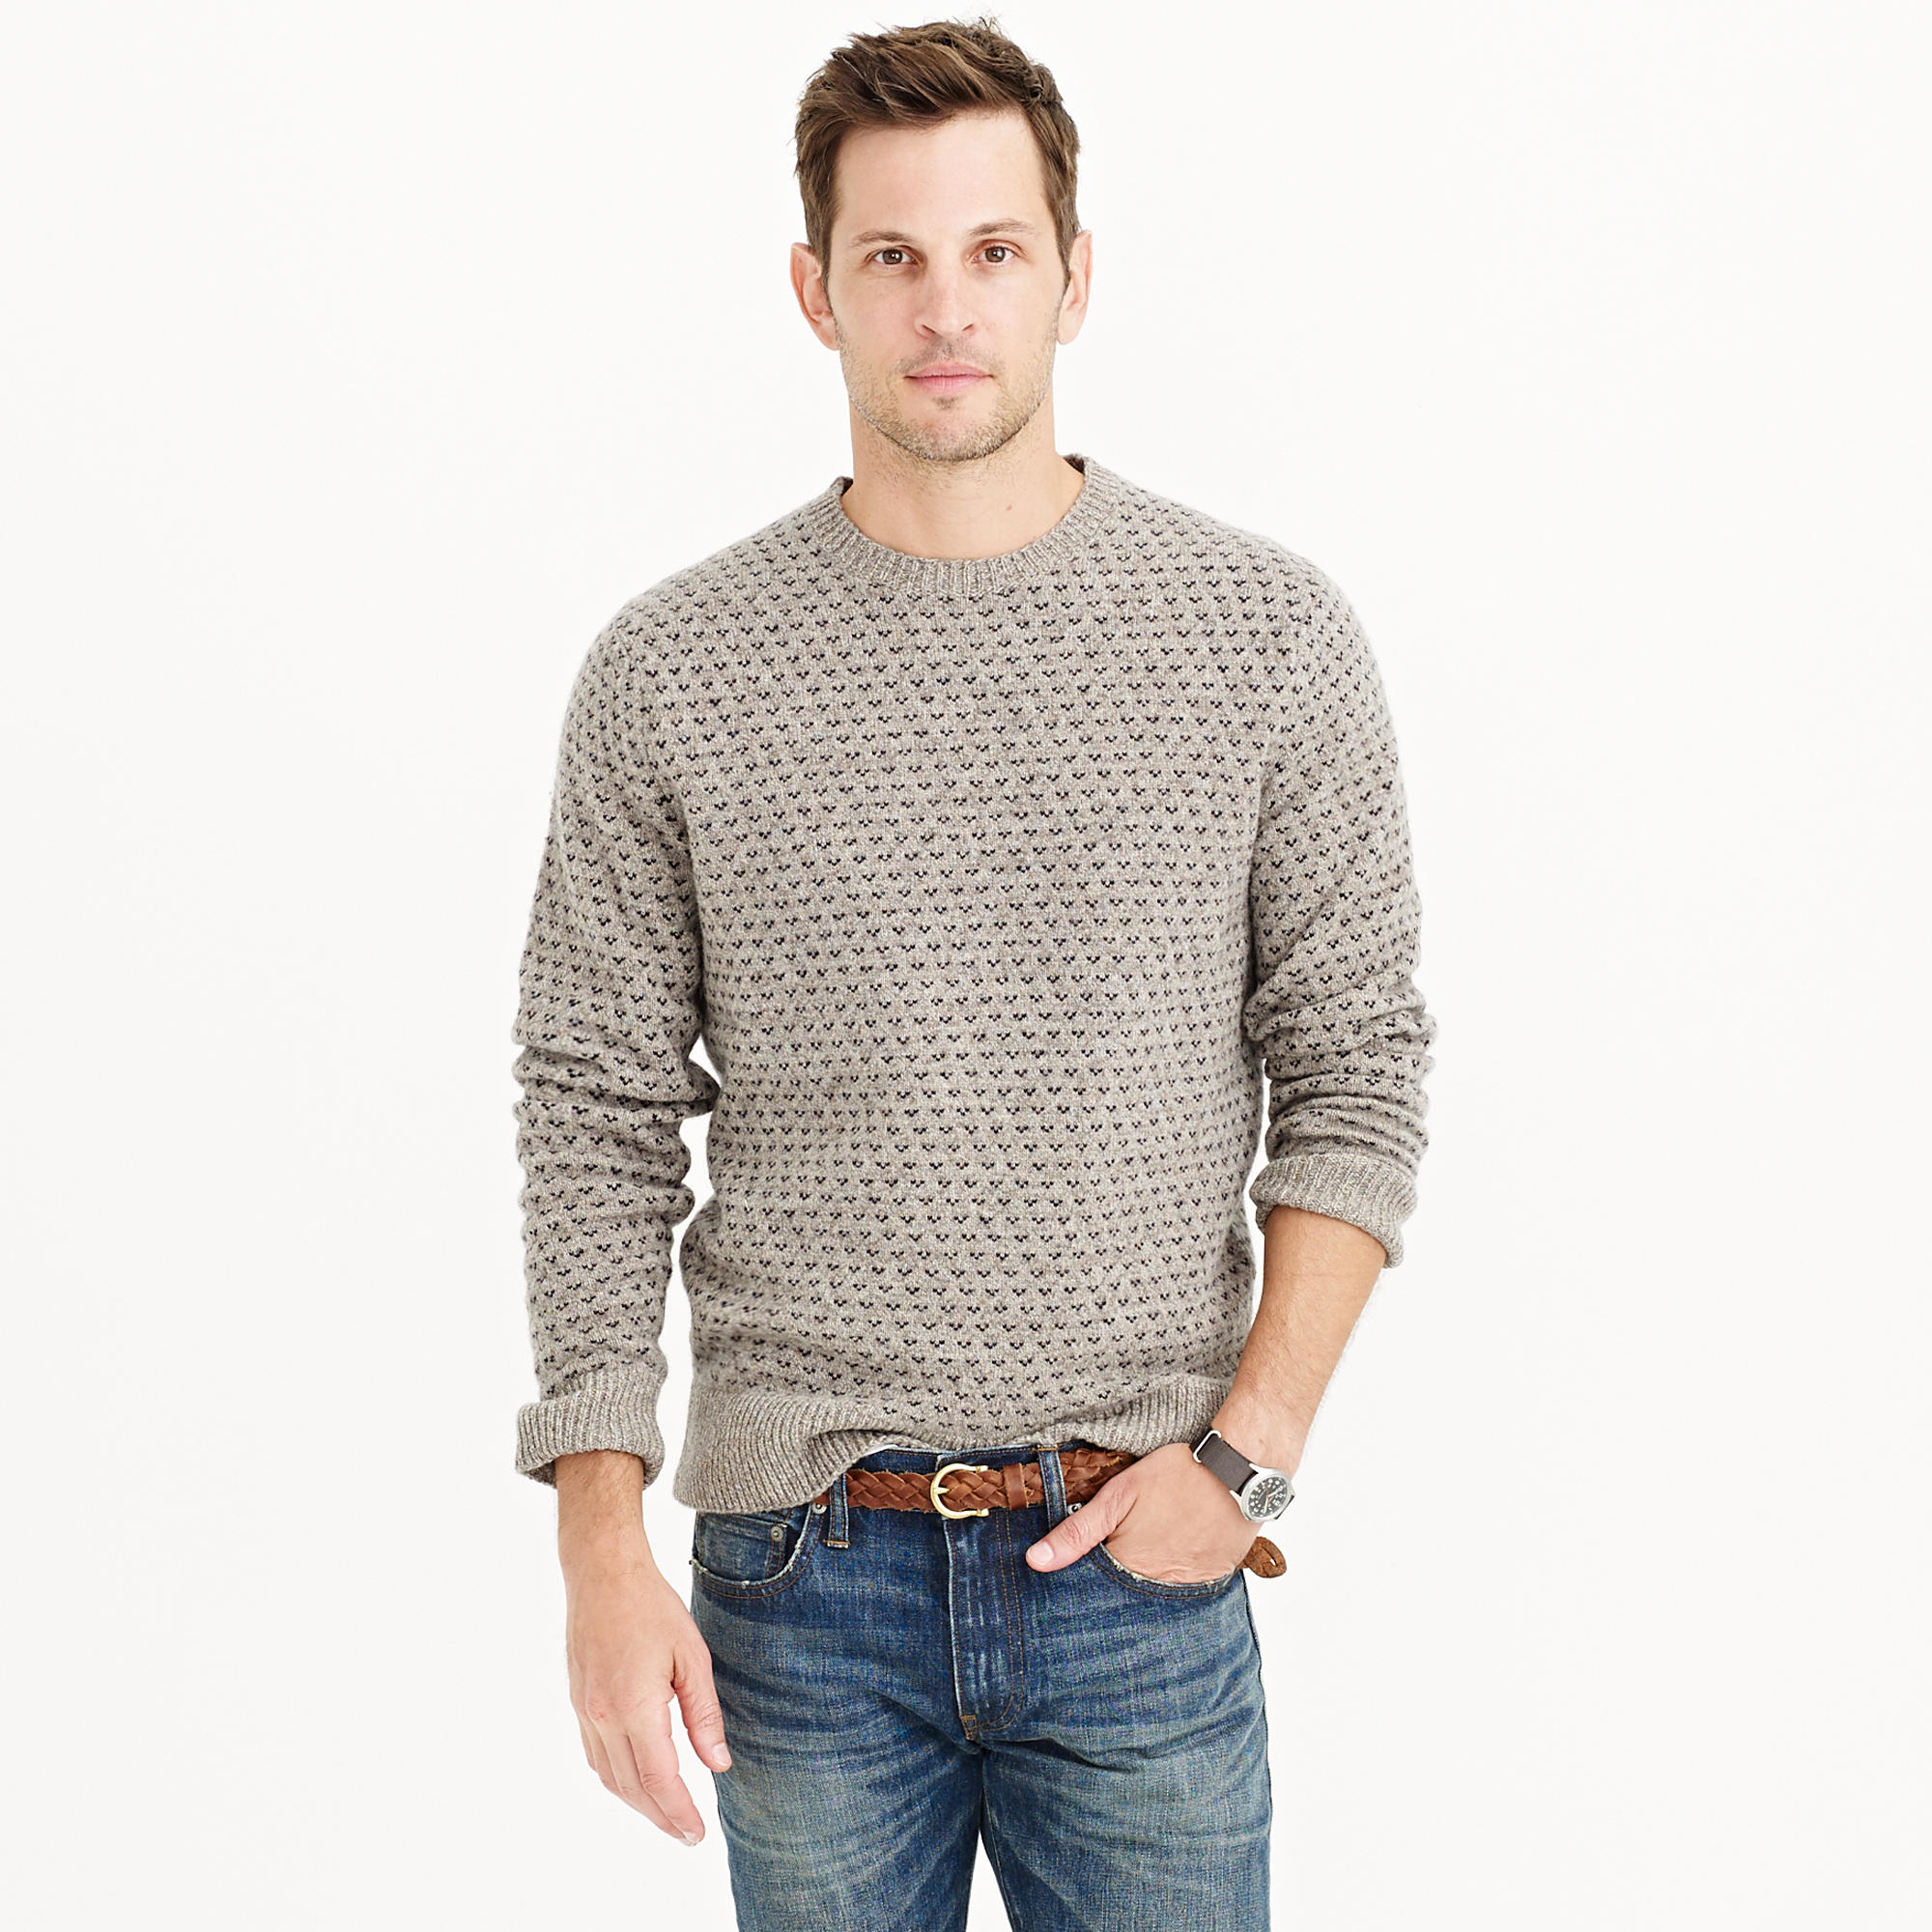 bfcb3e600b1 Lyst - J.Crew Lambswool Jacquard Sweater in Gray for Men